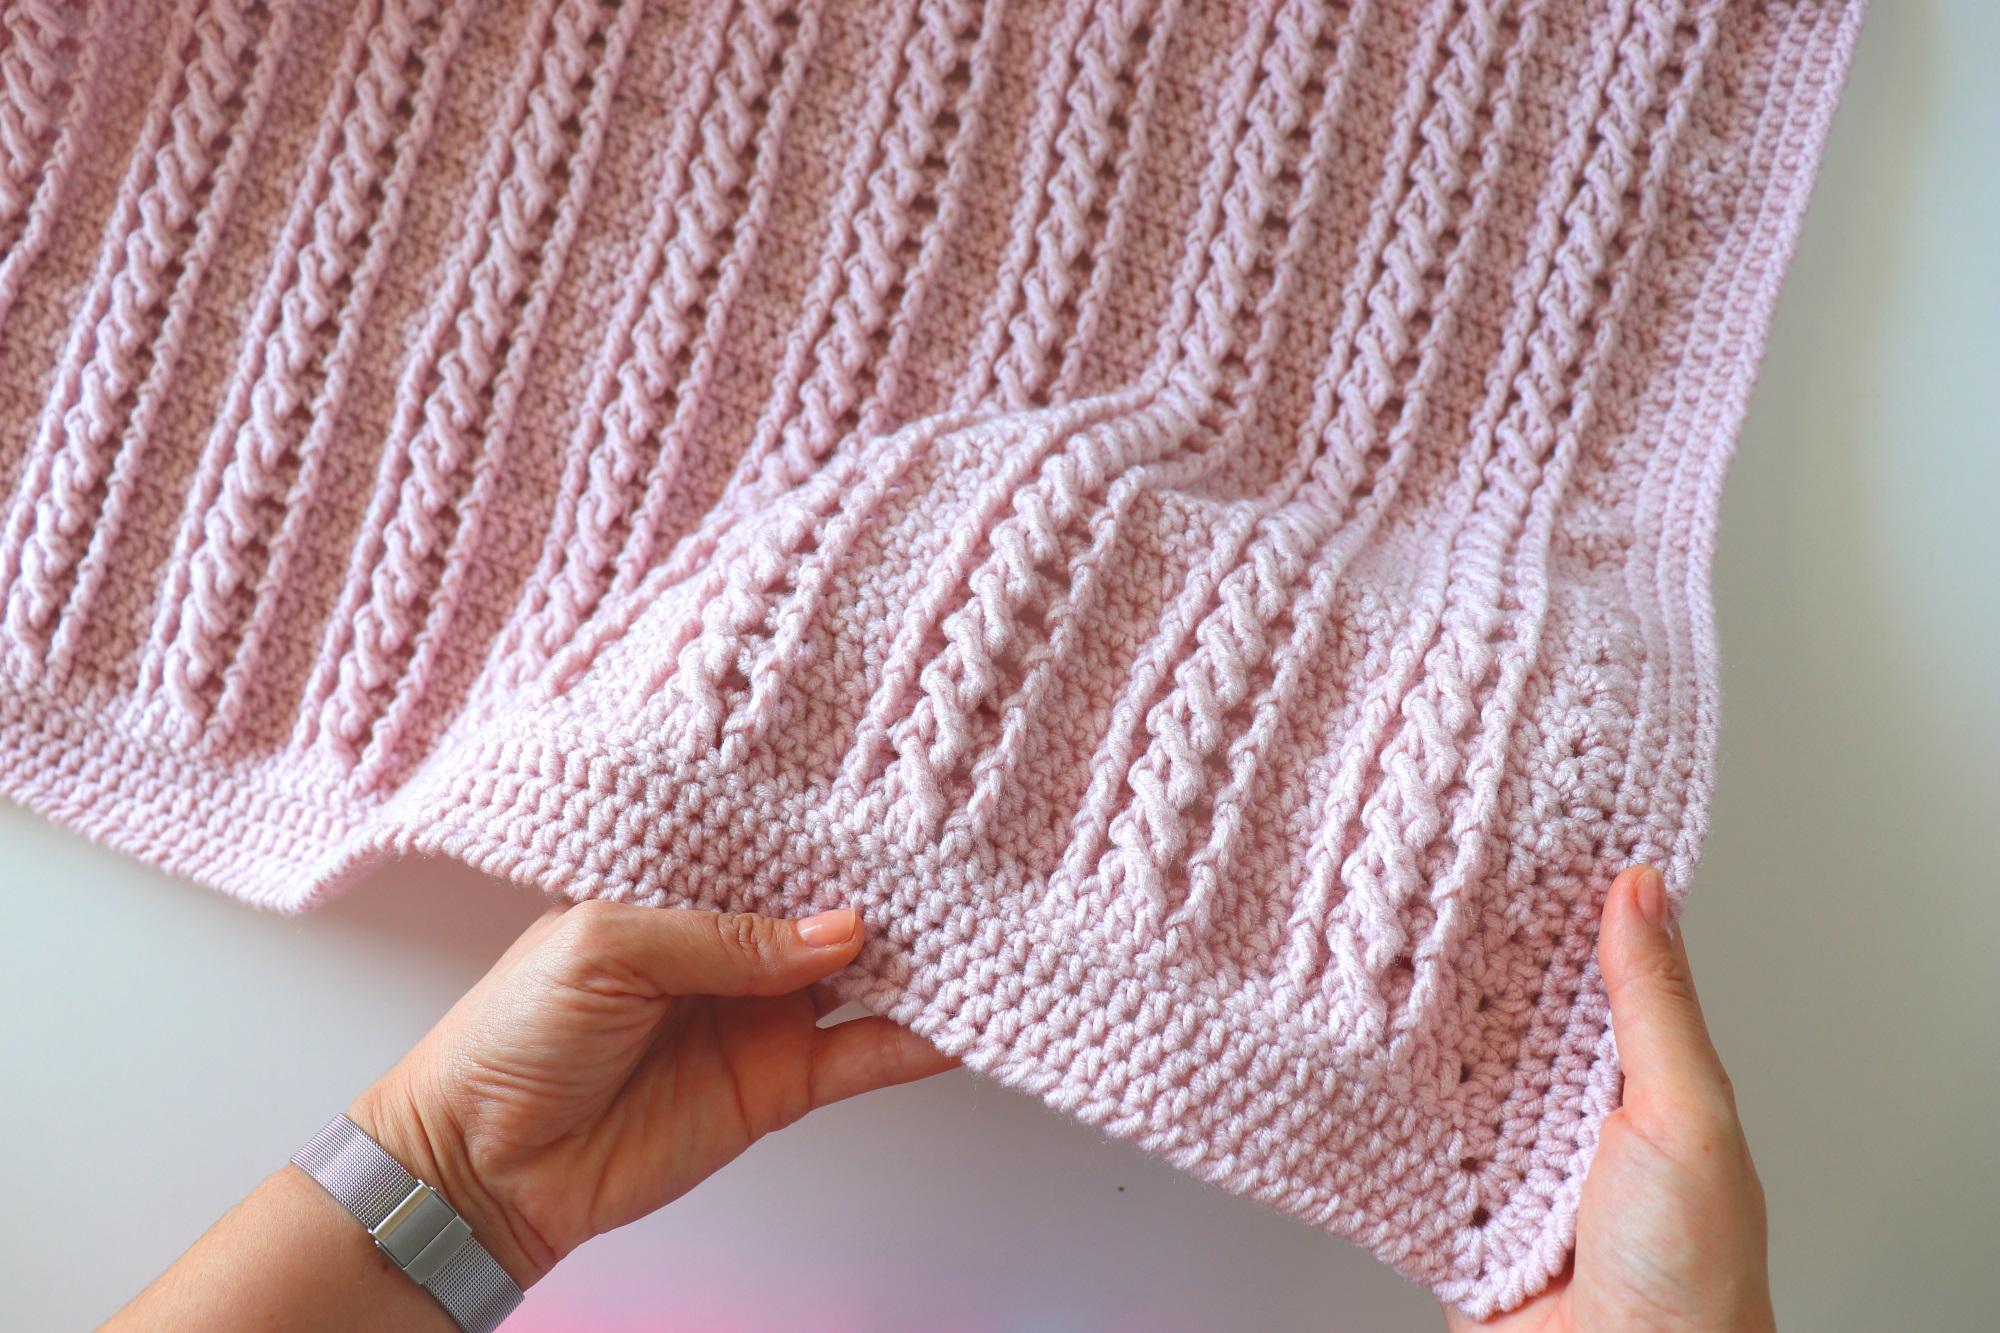 Crochet Easy Beginner Cable Blanket Tutorial With Written Pattern Sirin S Crochet